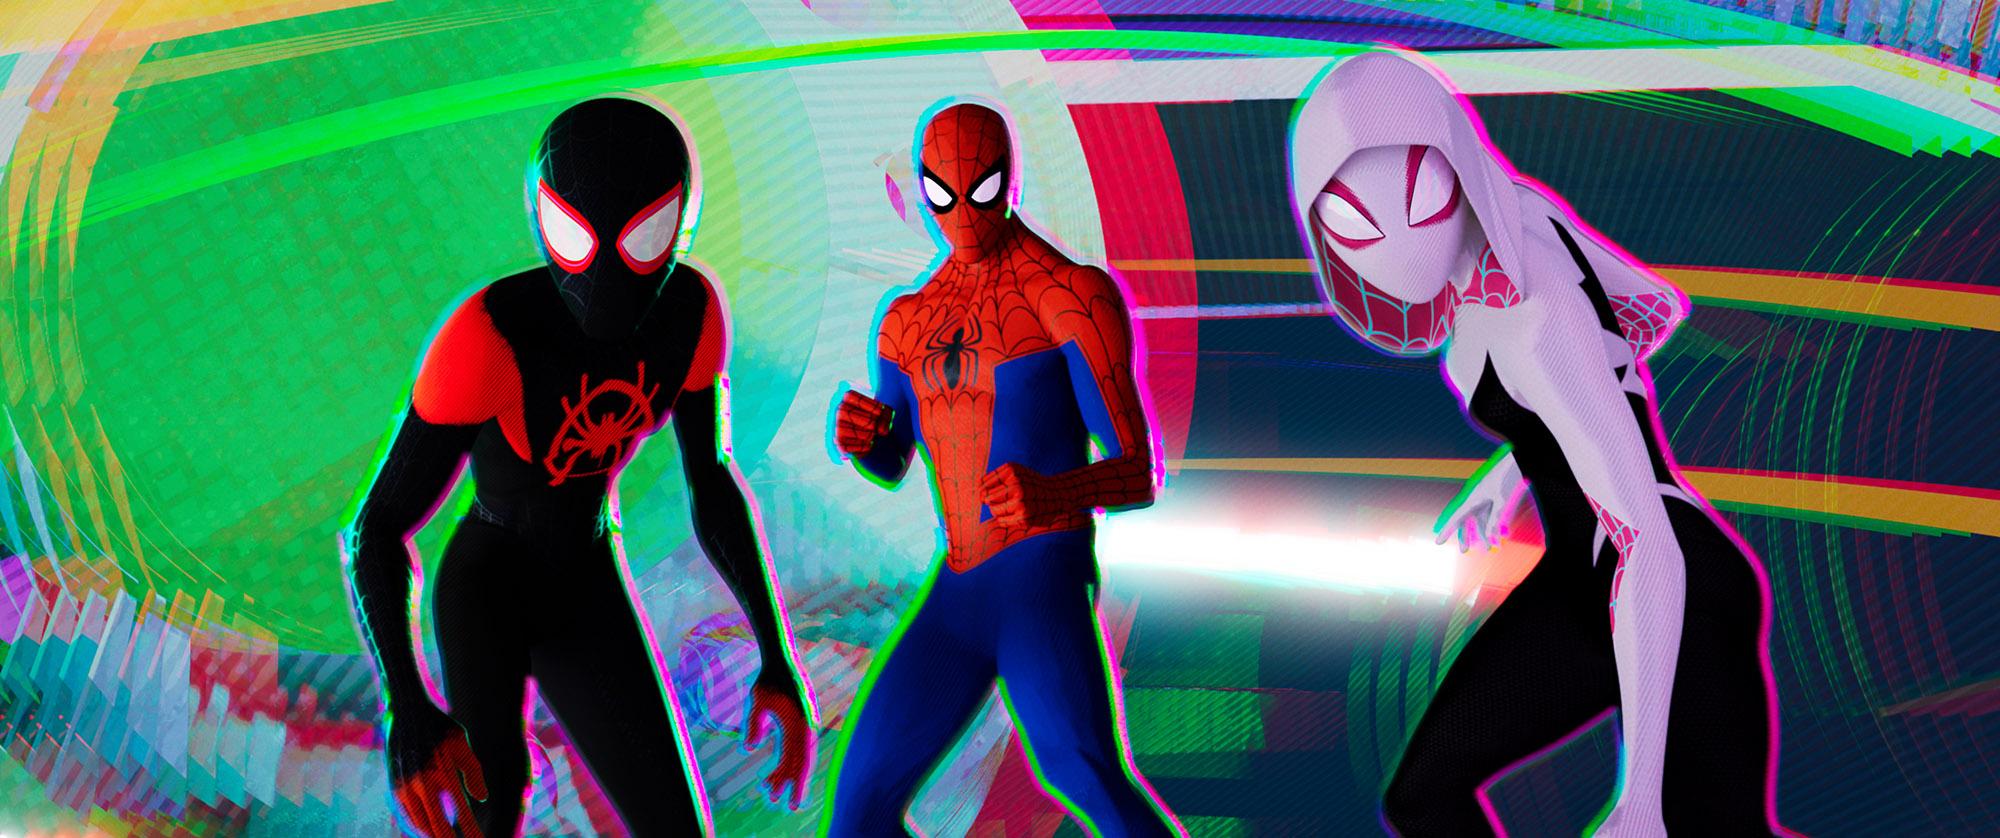 Spider Man New Generation La Critique Du Film